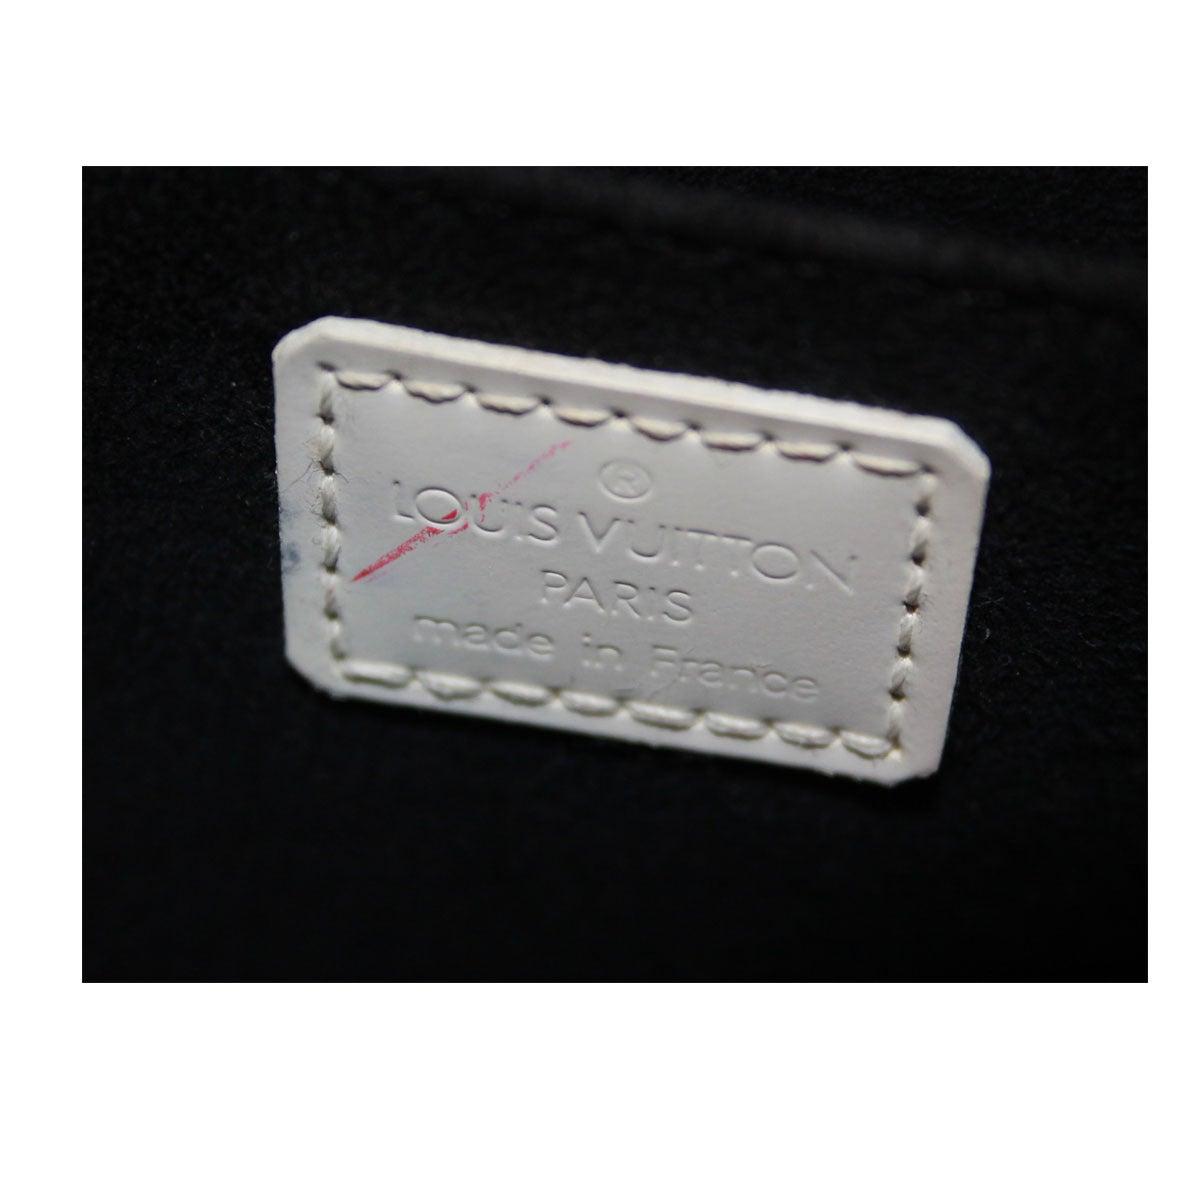 870872d77b6 Louis Vuitton Graffiti Alma PM Ivory and Black Handbag at 1stdibs